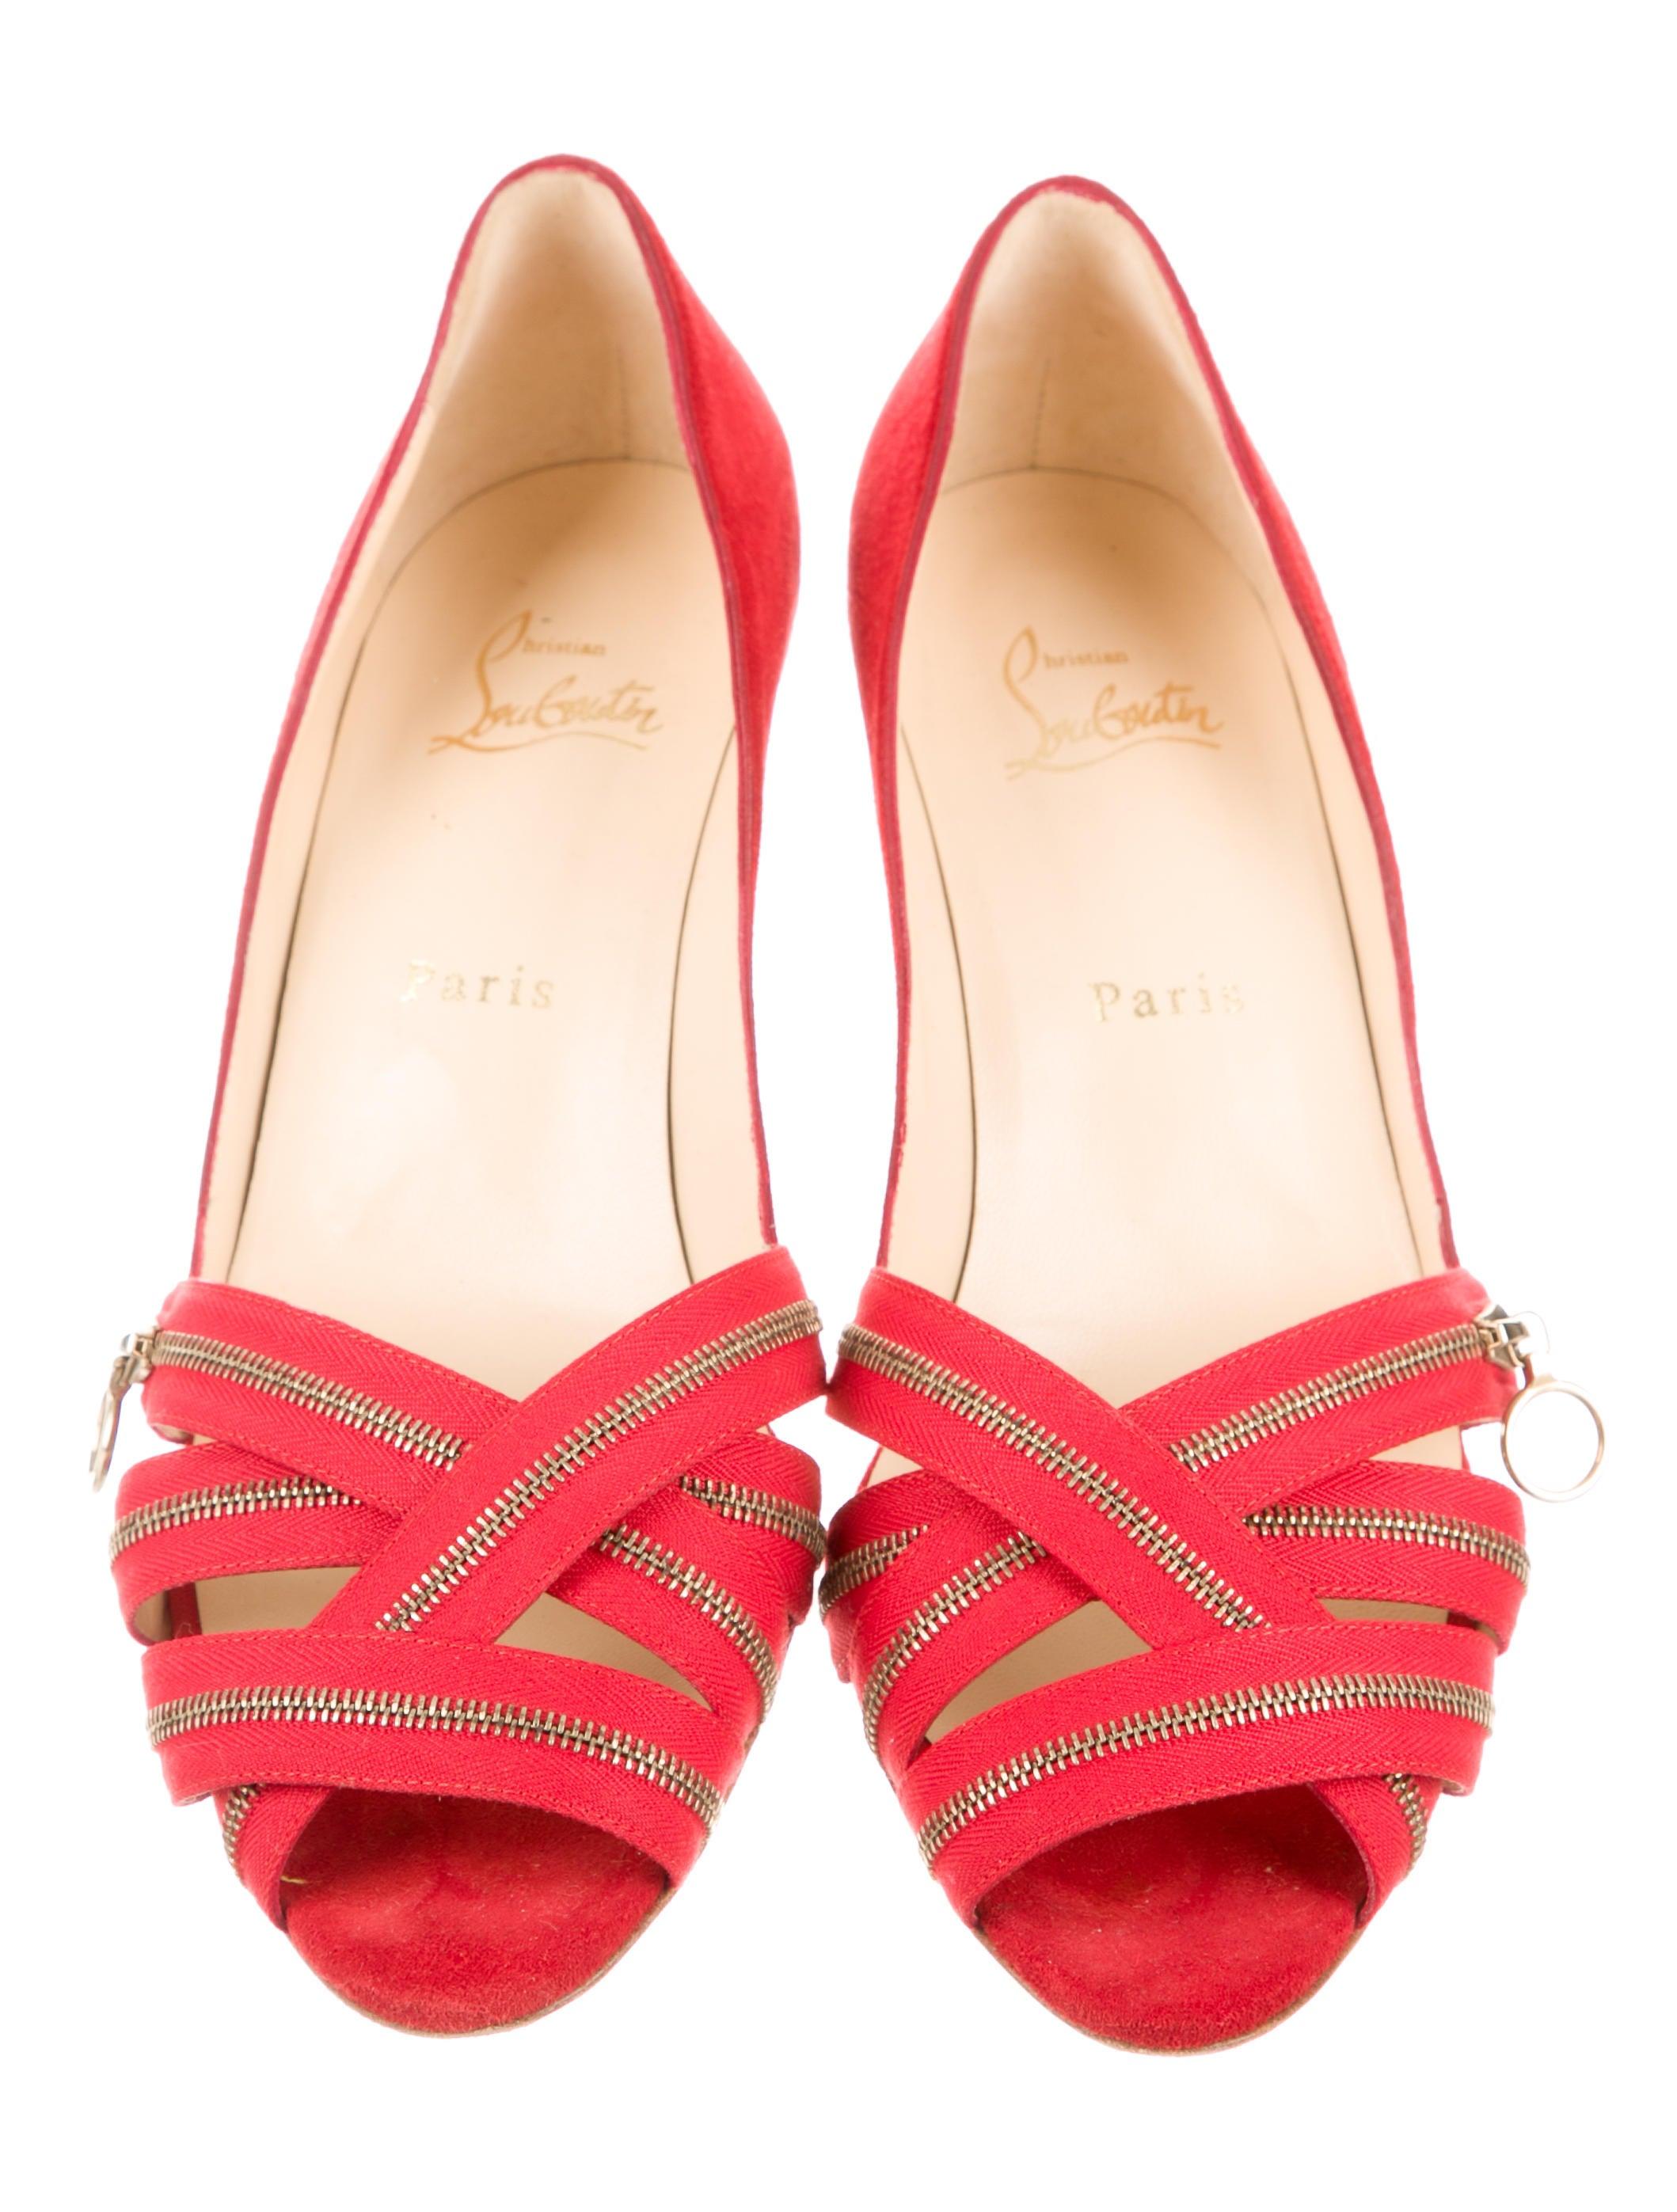 christian louboutin zipper-embellished sandals